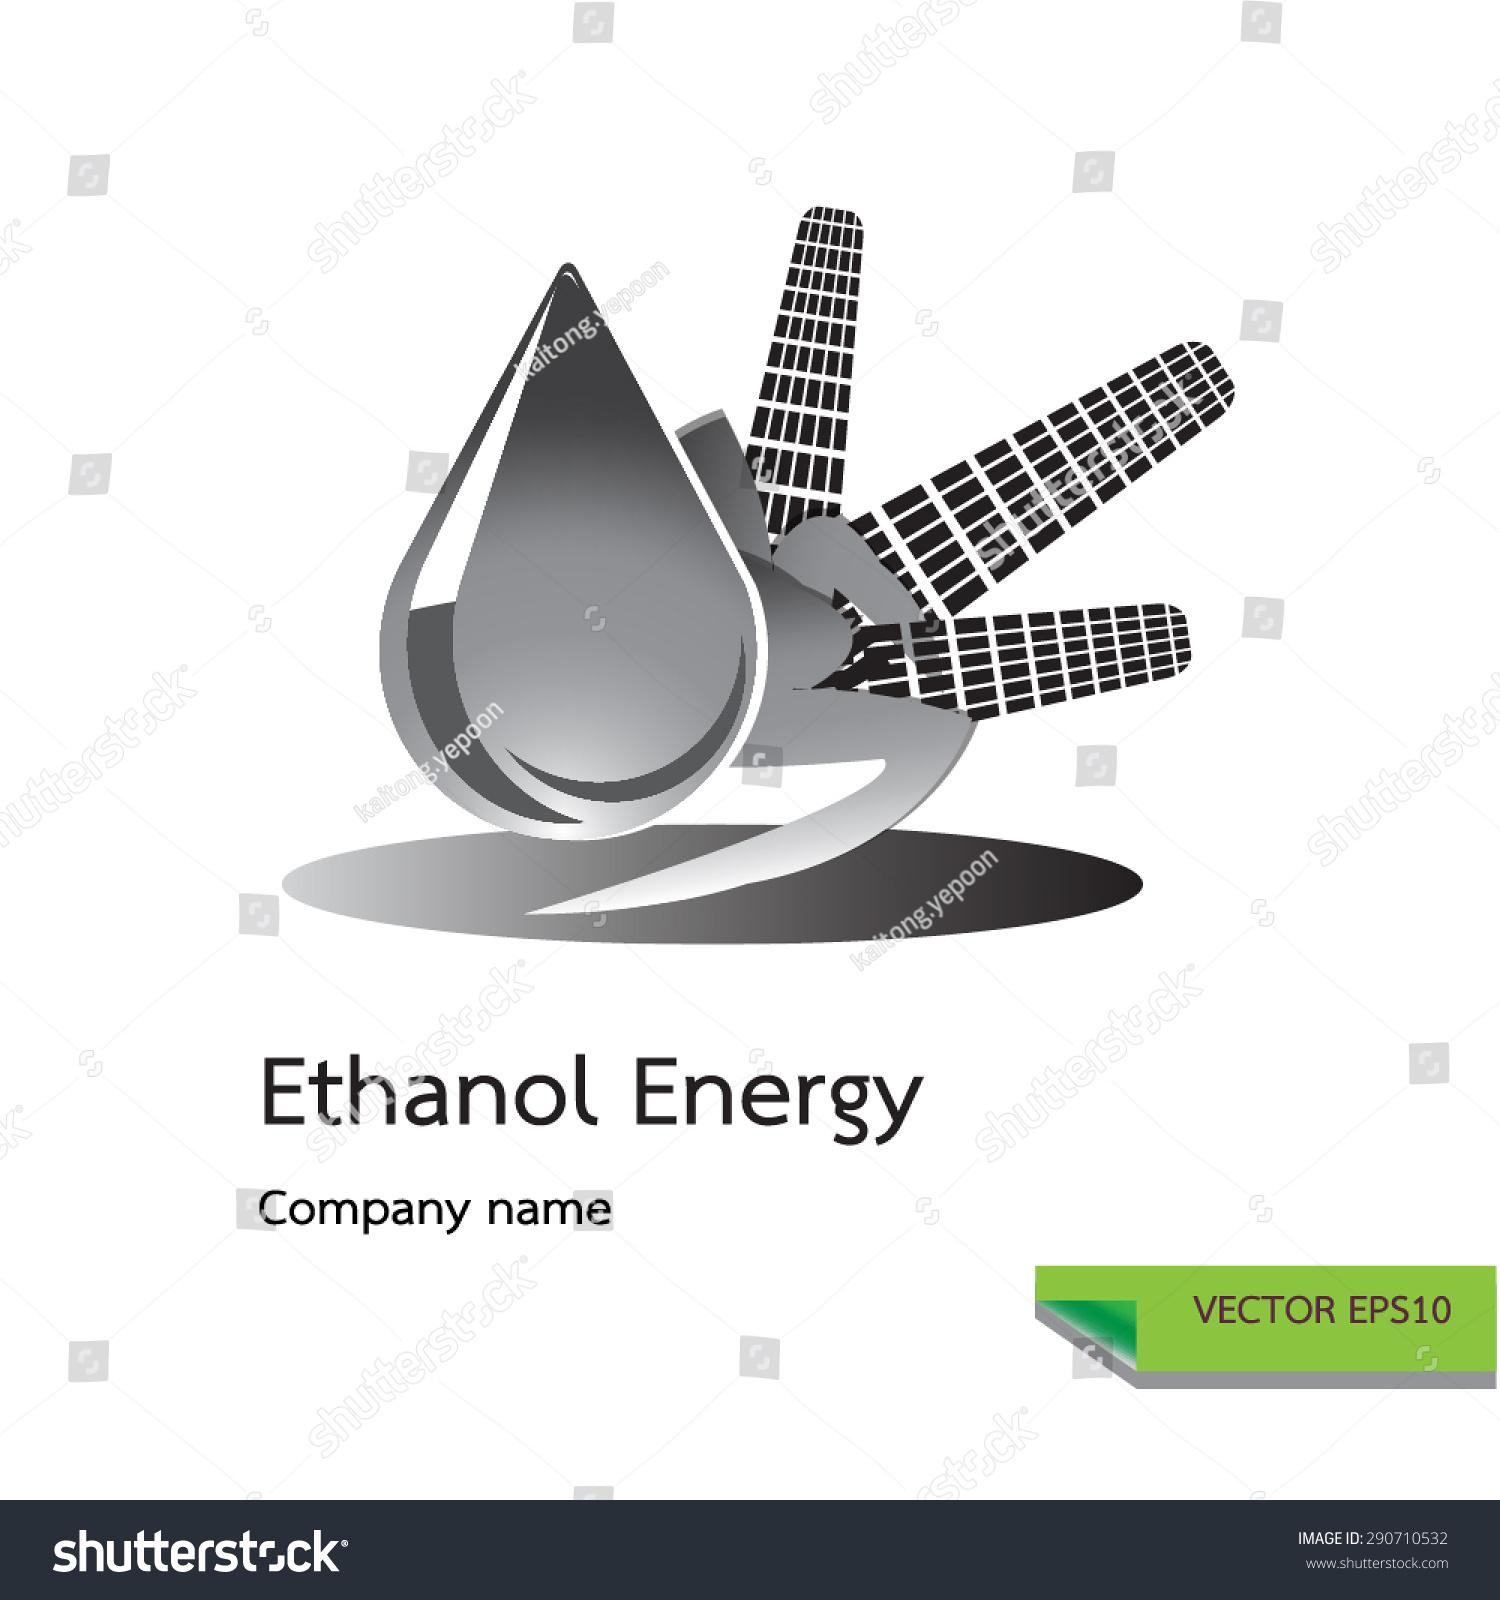 Vector icon made corn ethanol symbols stock vector 290710532 vector icon made from corn and ethanol symbols ethanol energy logo design concept buycottarizona